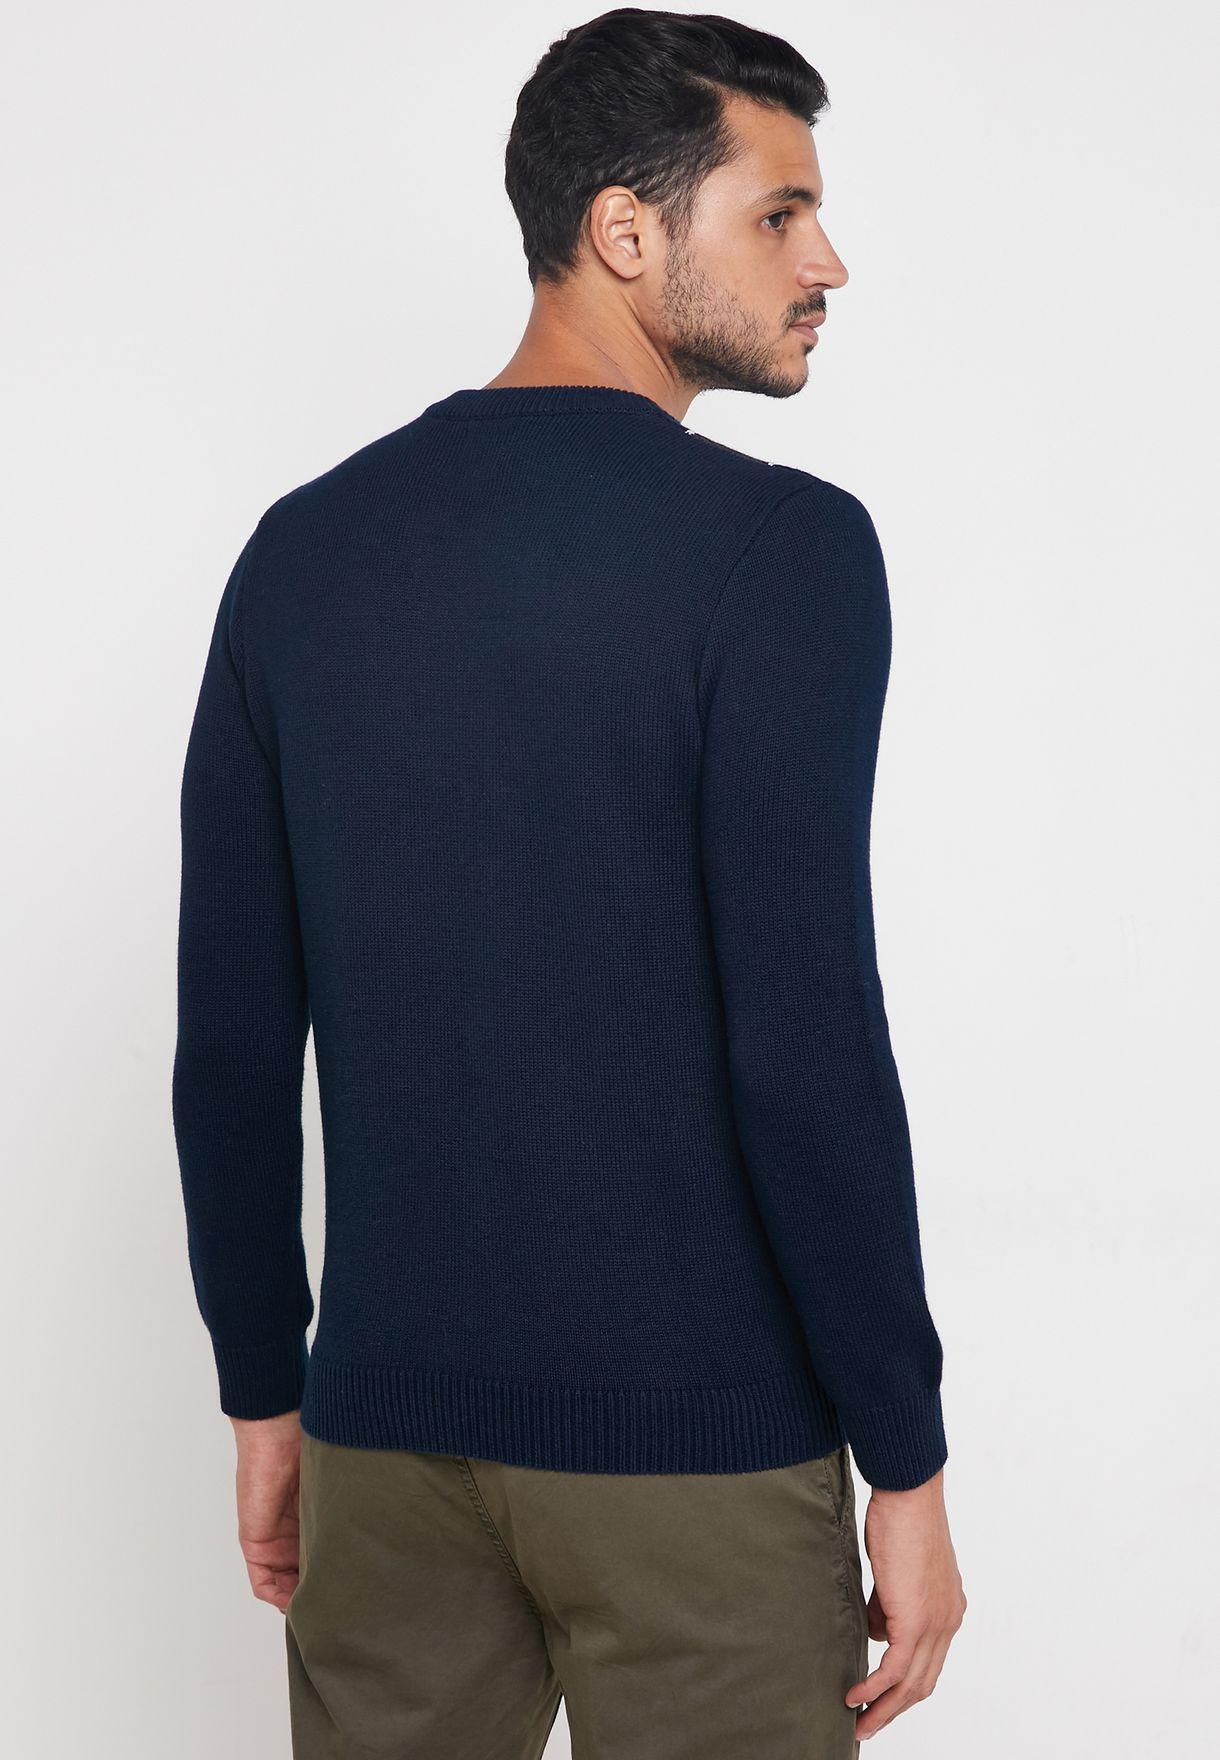 Turnpike Stripe Sweater